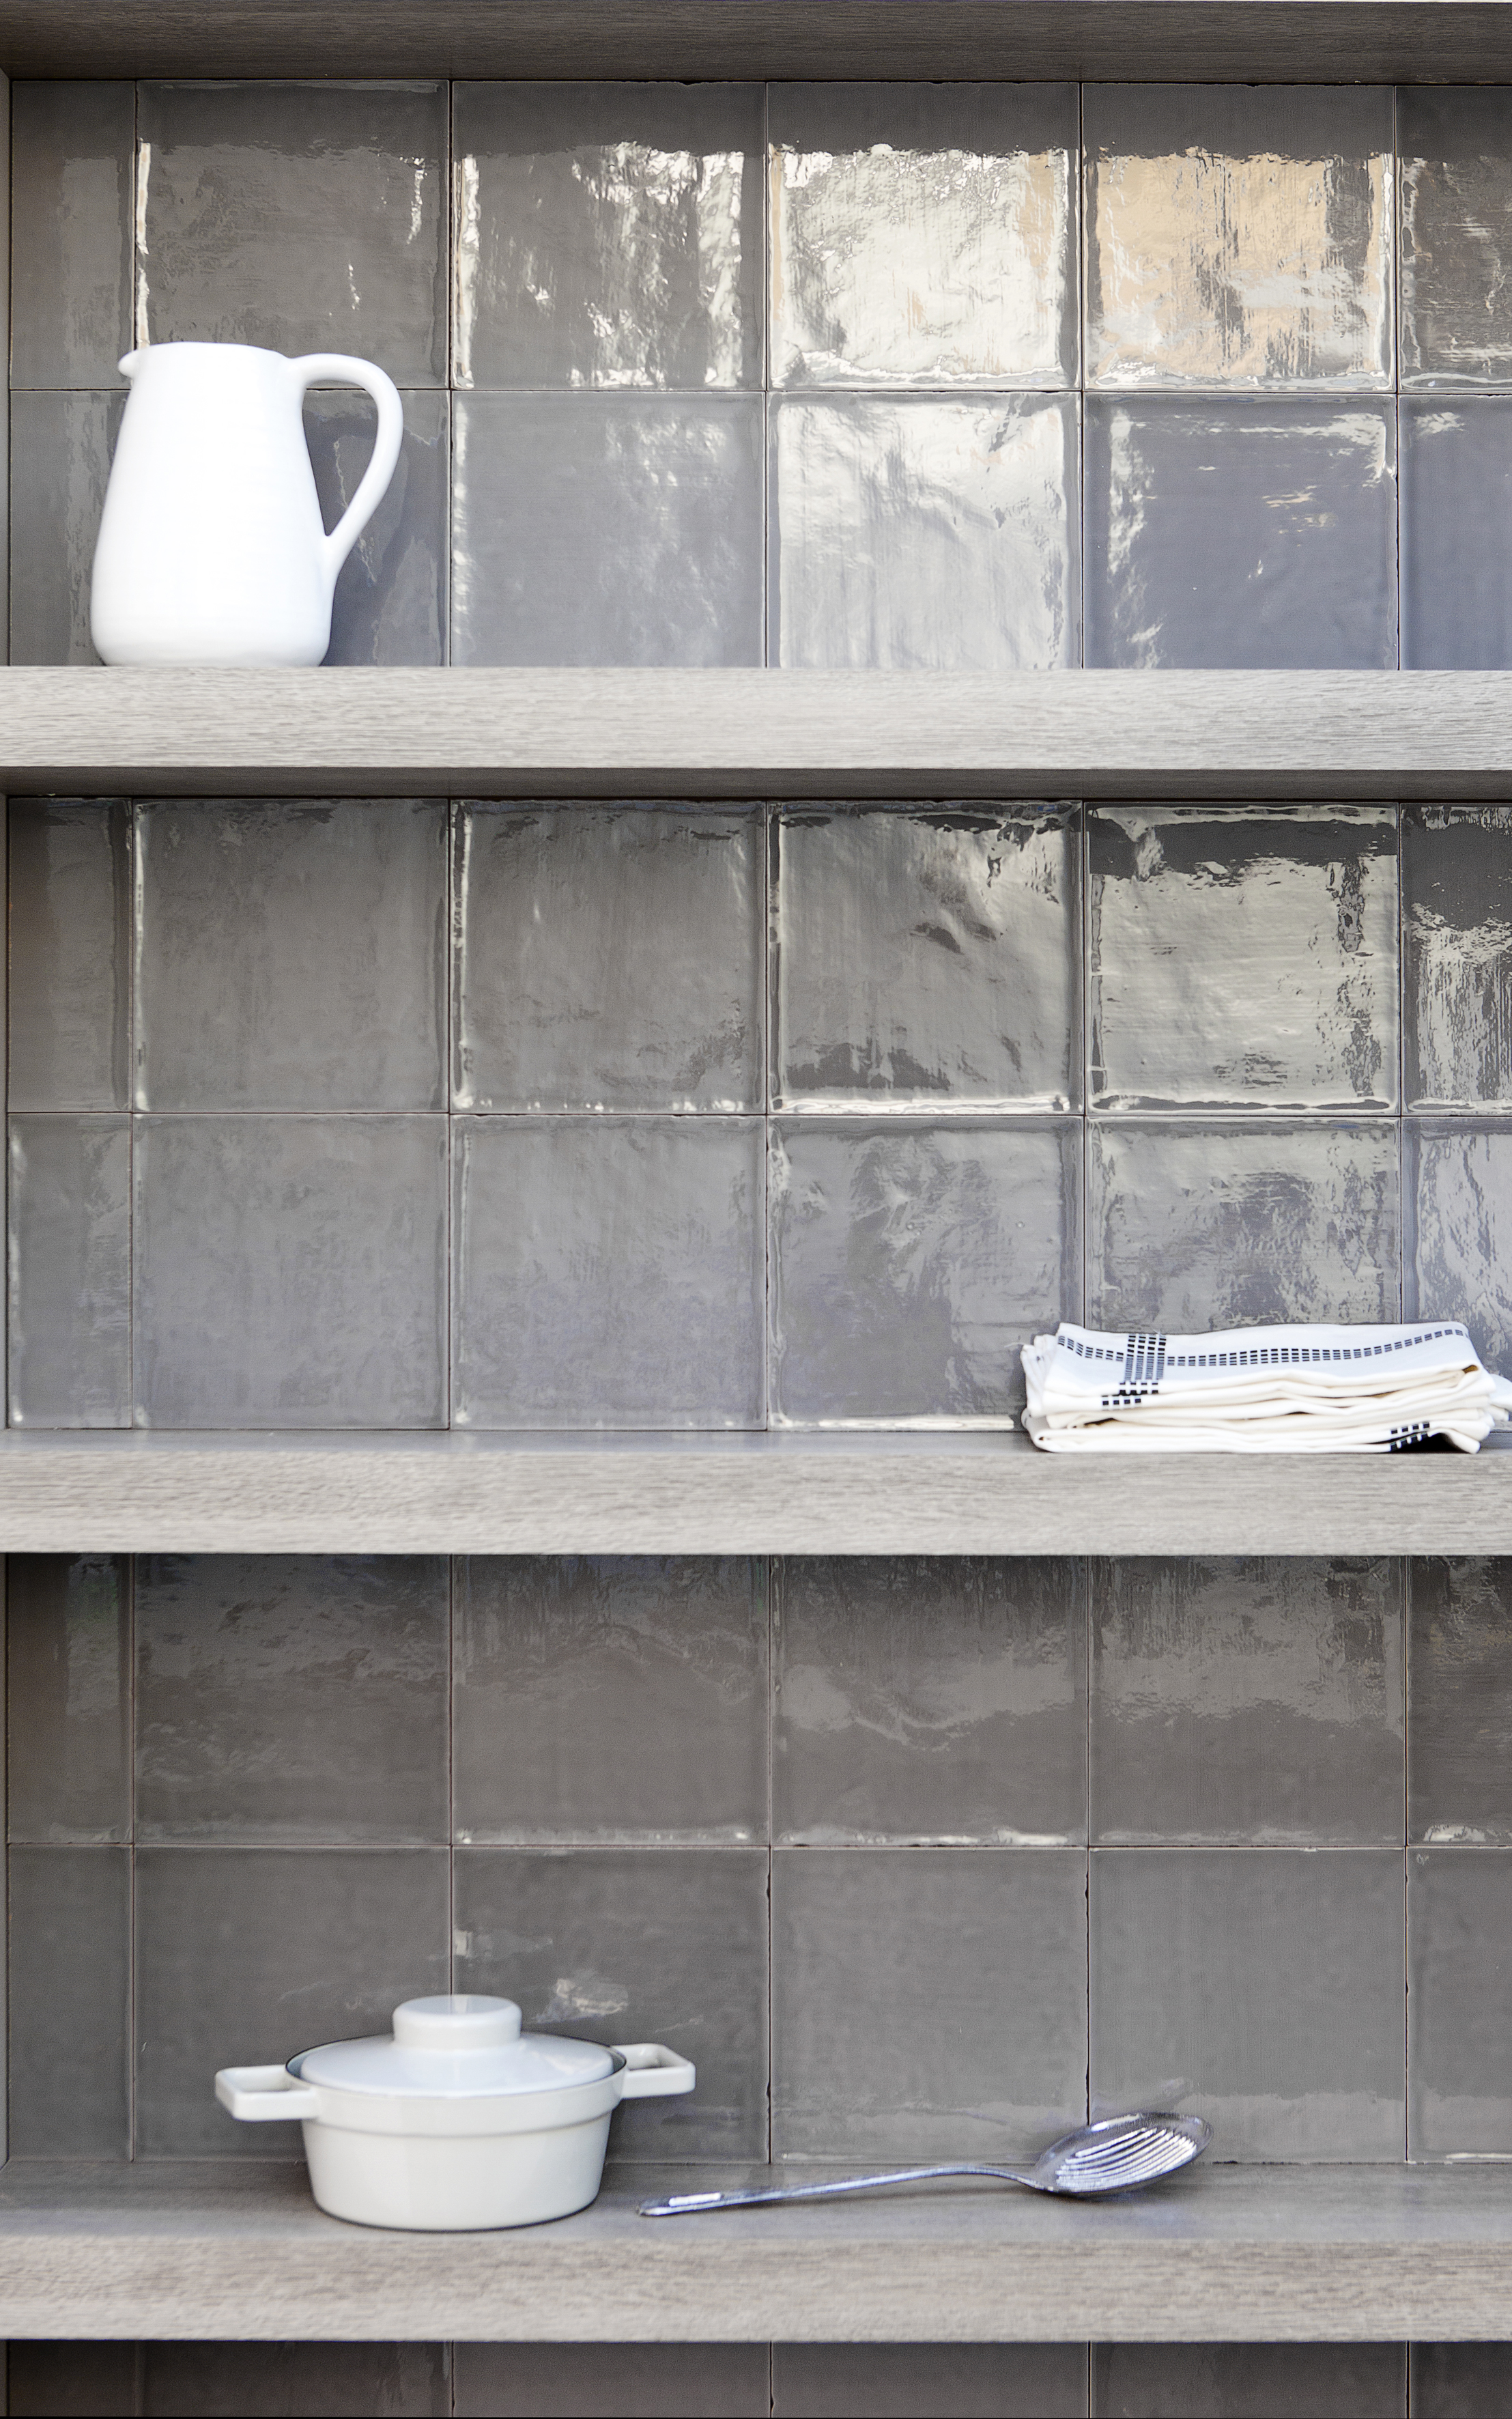 Vtwonen Keuken Grando : Keuken vtwonen 2012 tegels ? Grando Keukens & Bad Zaandam